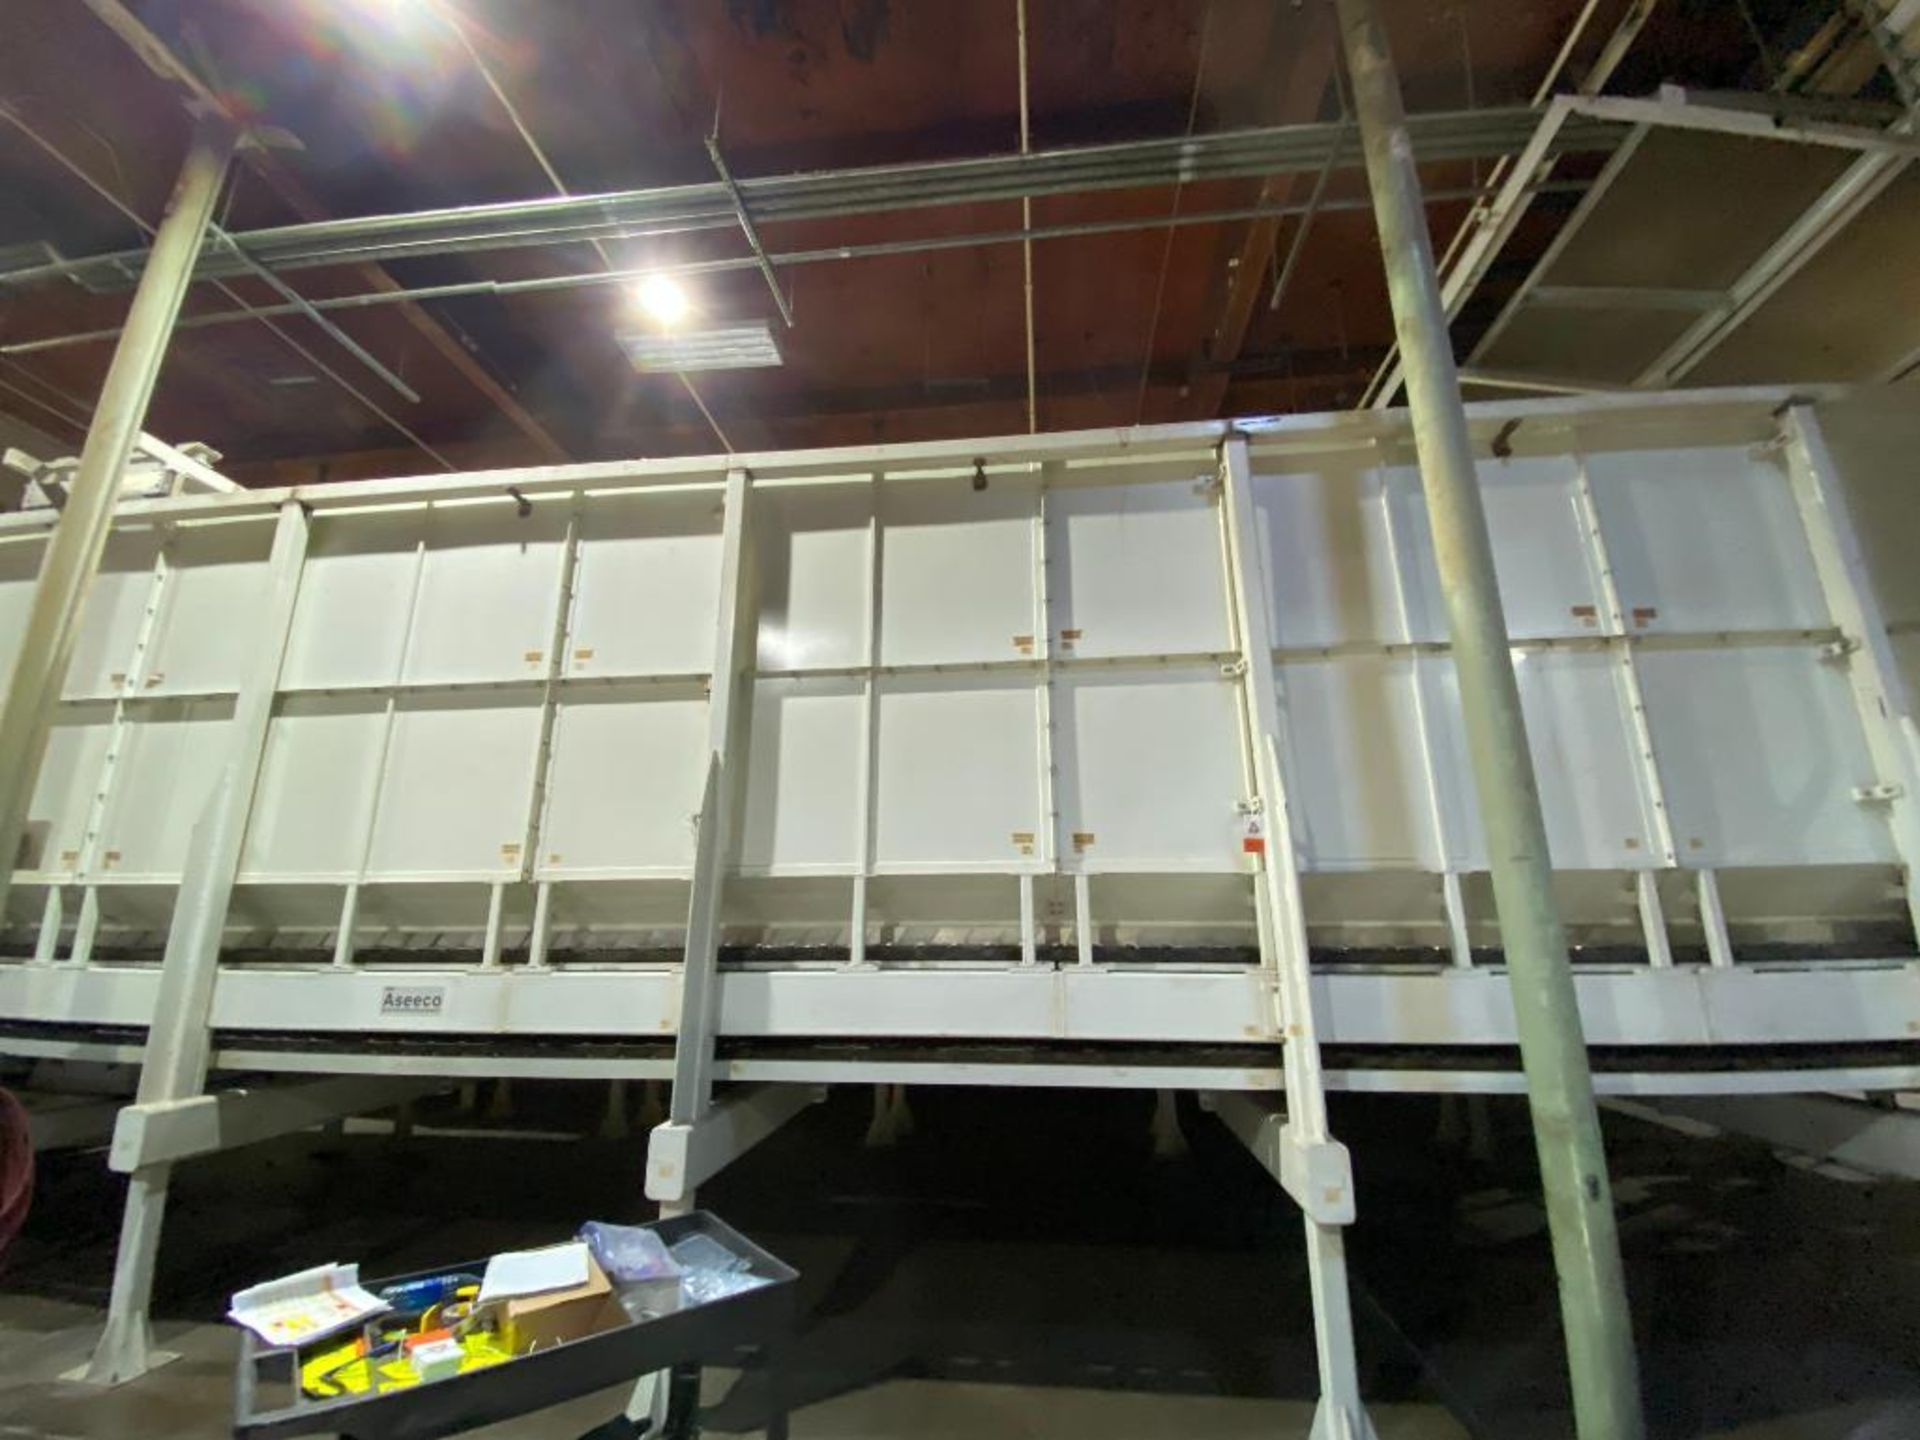 Aseeco bulk accumulation bin